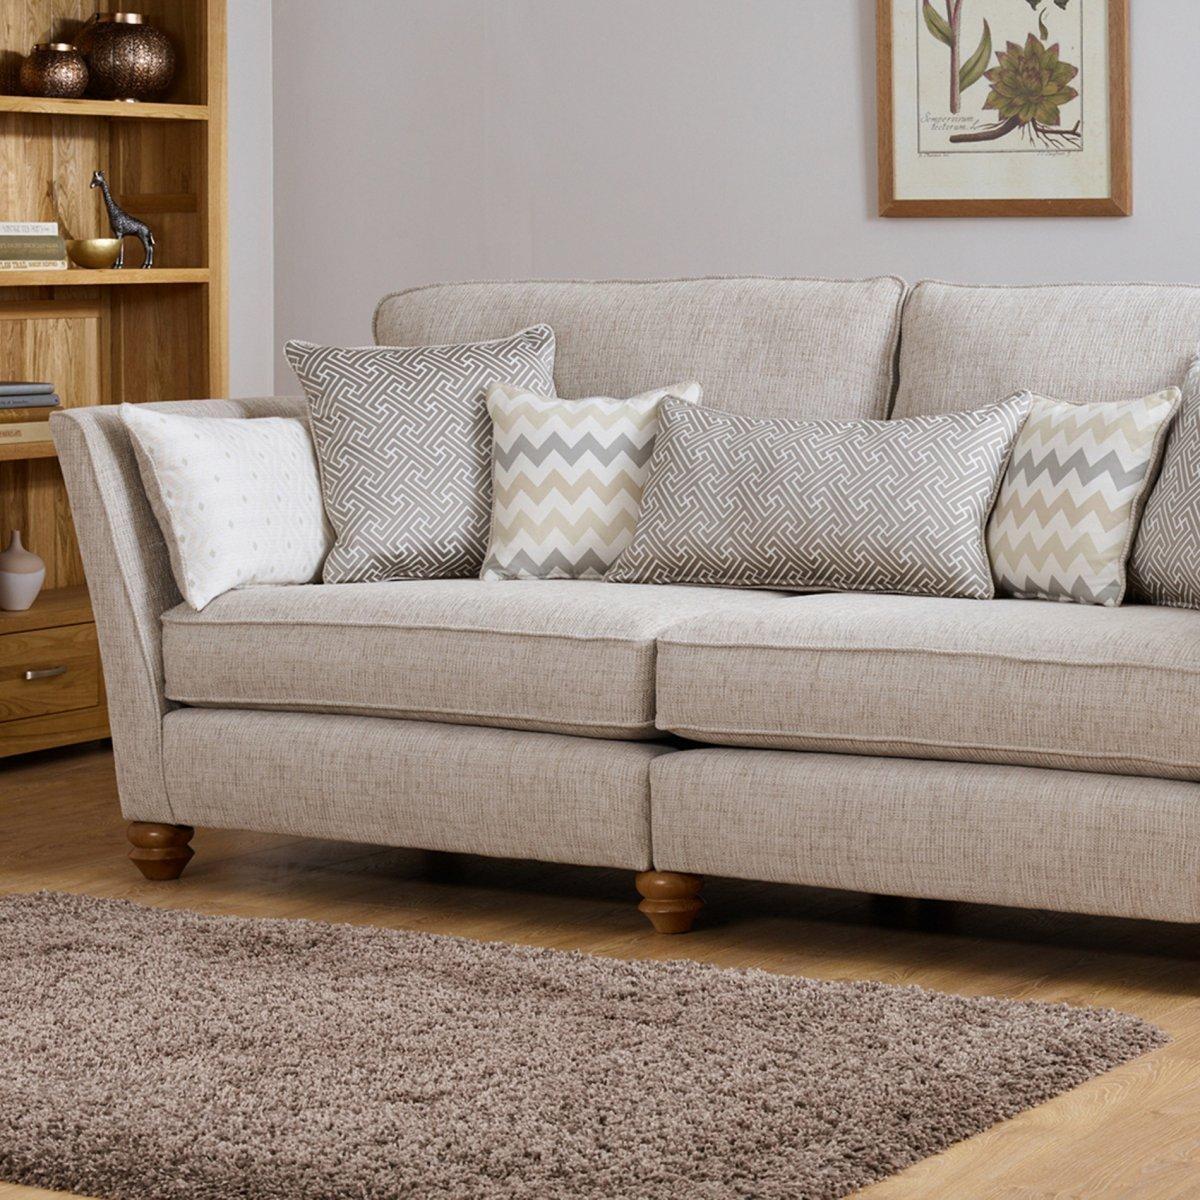 Gainsborough 4 Seater Sofa In Brown | Oak Furniture Land With Regard To Four Seat Sofas (Image 15 of 20)